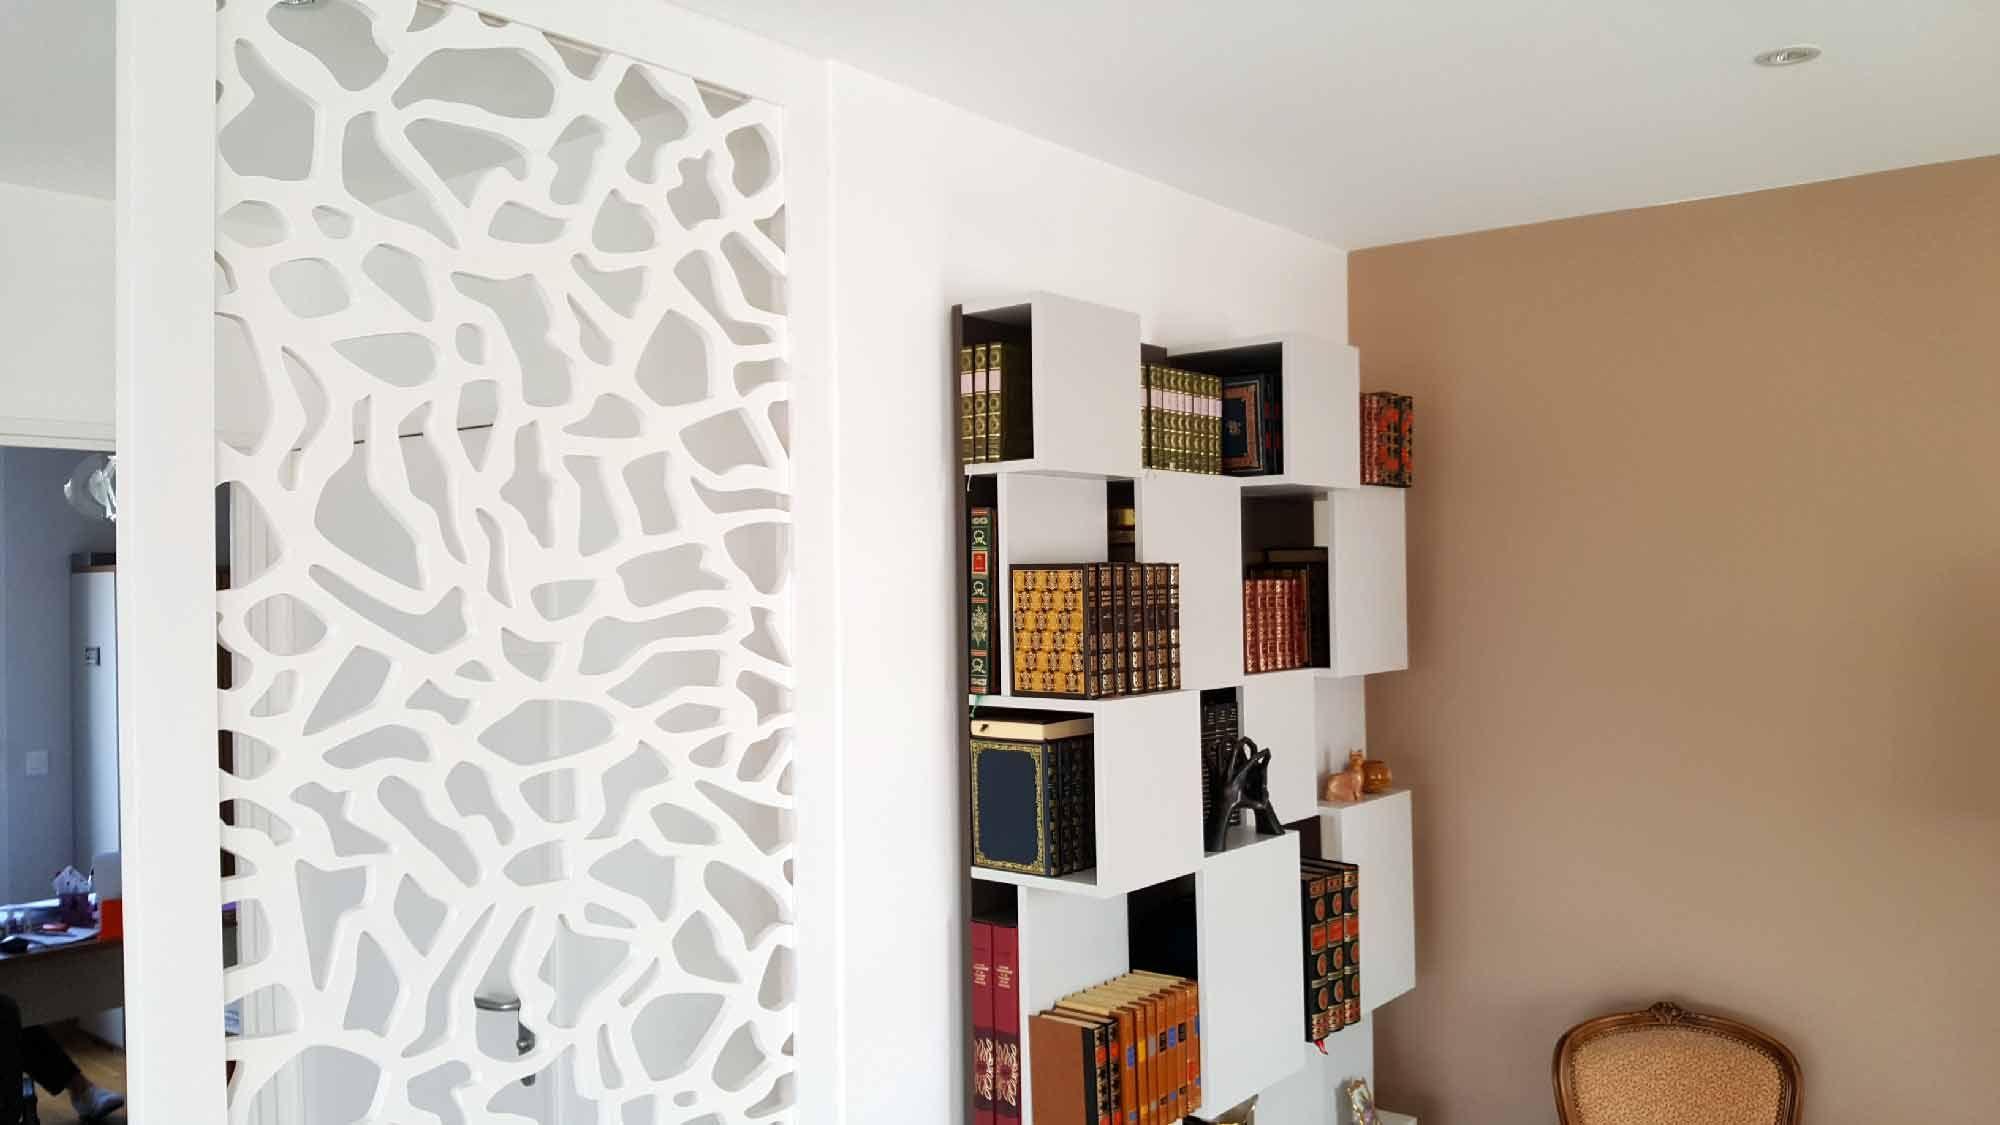 claustra mucida projet maison claustra claustra bois et bois. Black Bedroom Furniture Sets. Home Design Ideas